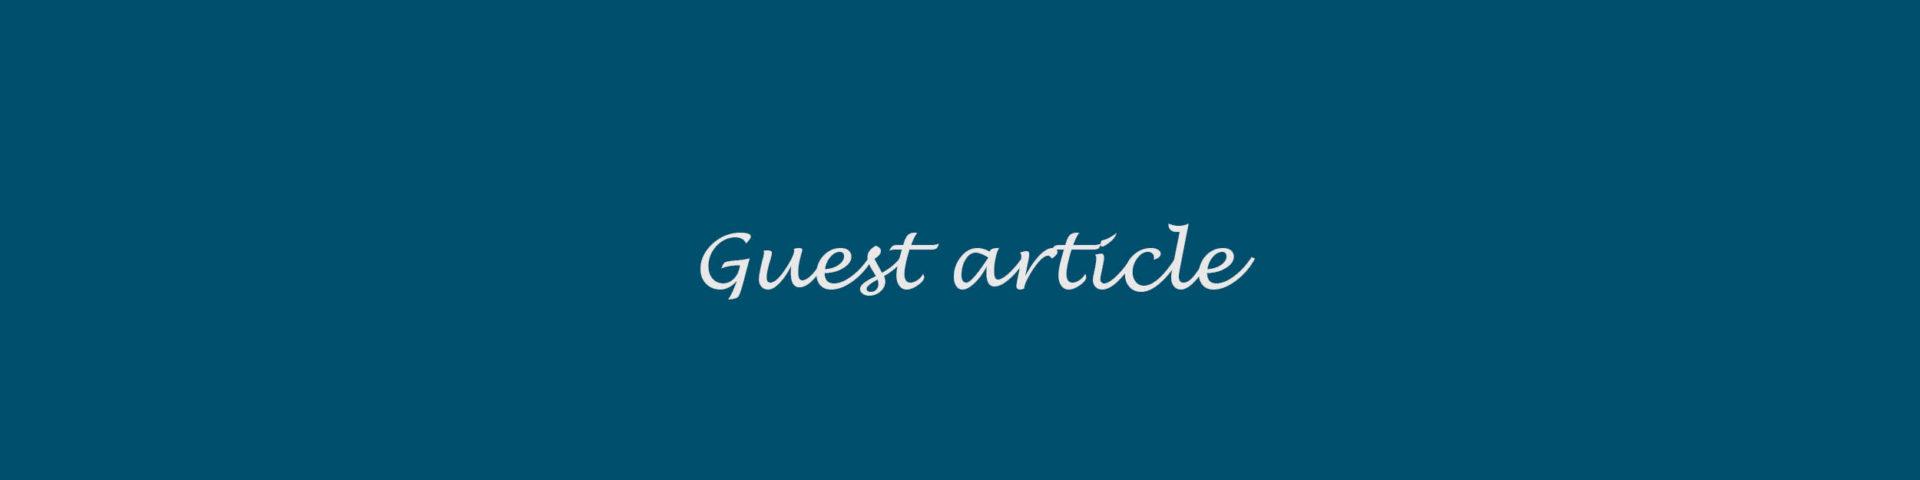 Guest article